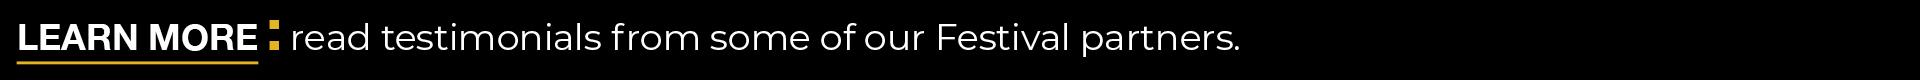 Festival Testimonials